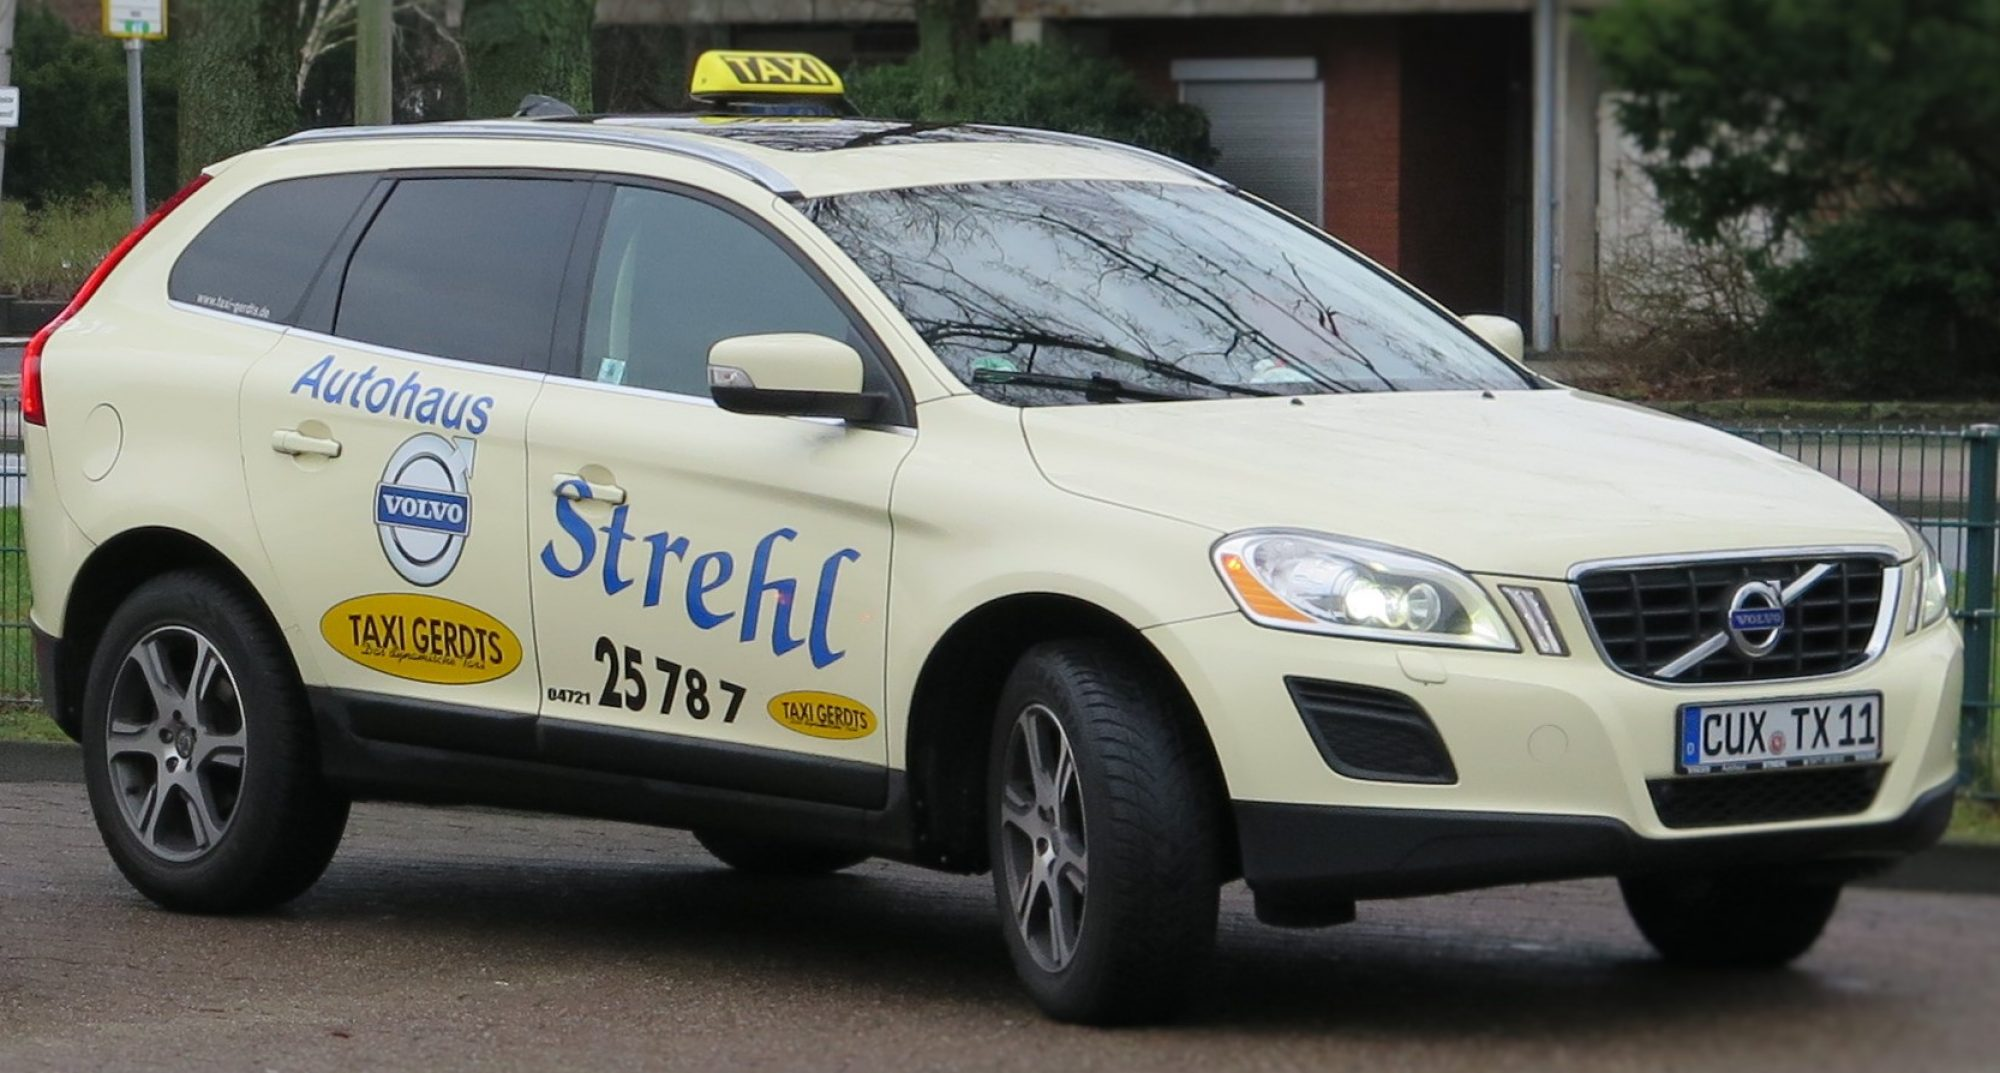 Taxi Gerdts